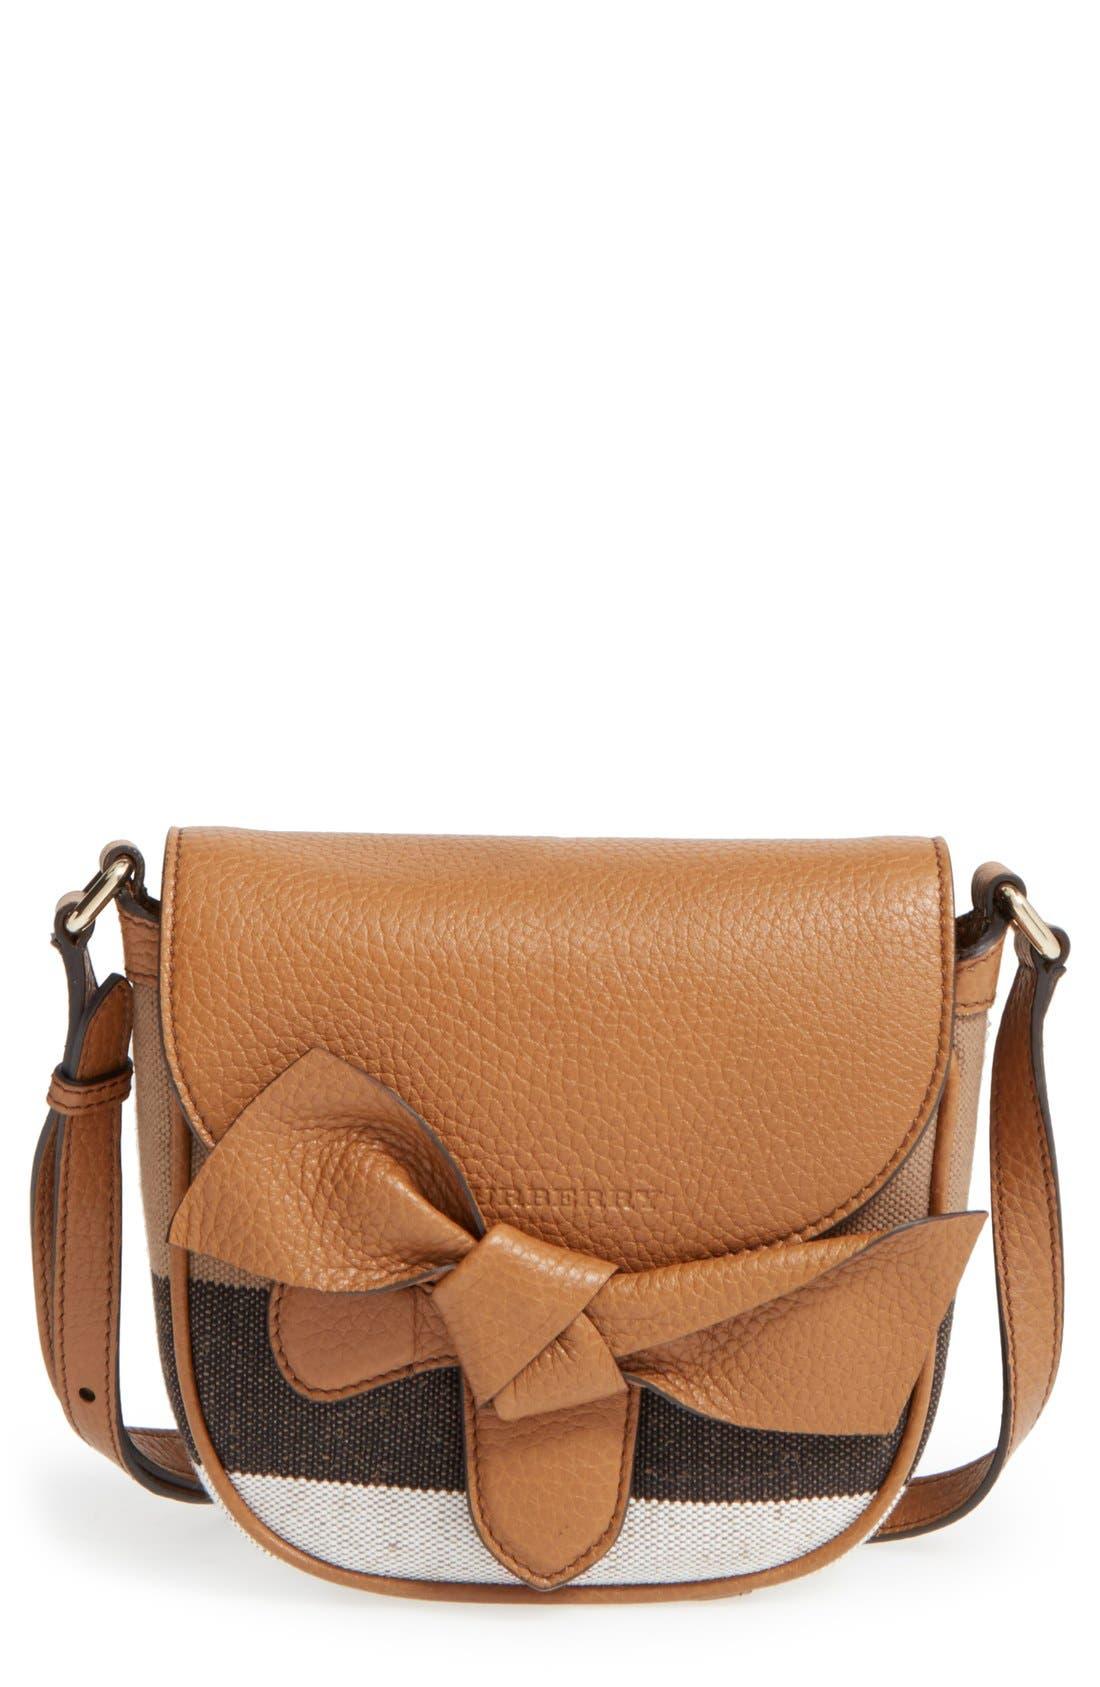 BURBERRY,                             Canvas Check & Leather Crossbody Bag,                             Main thumbnail 1, color,                             251